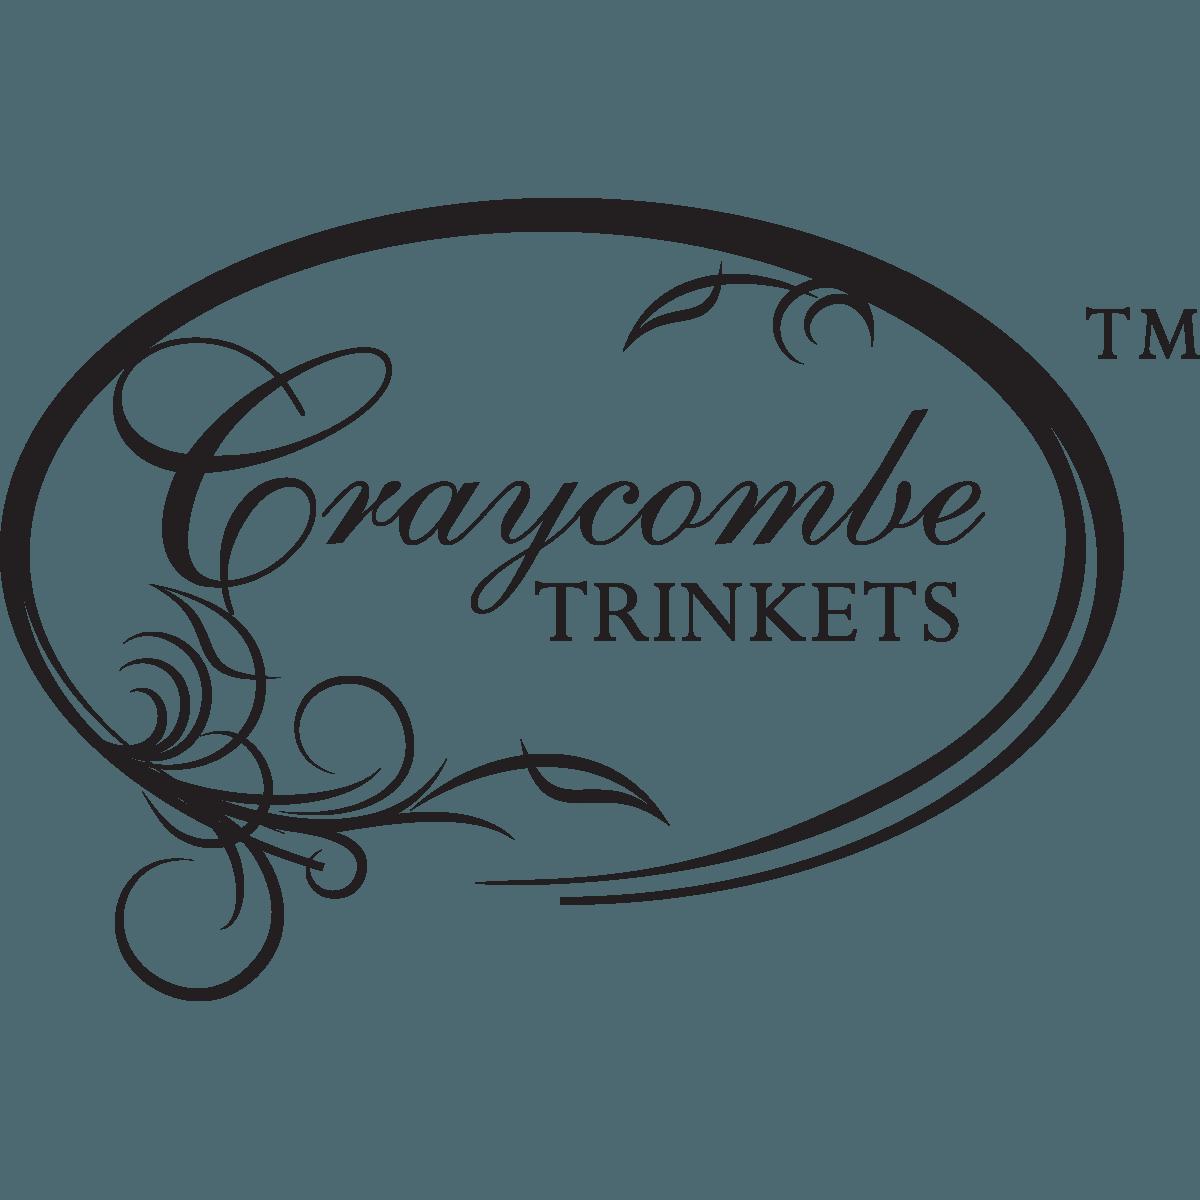 Craycombe Trinkets